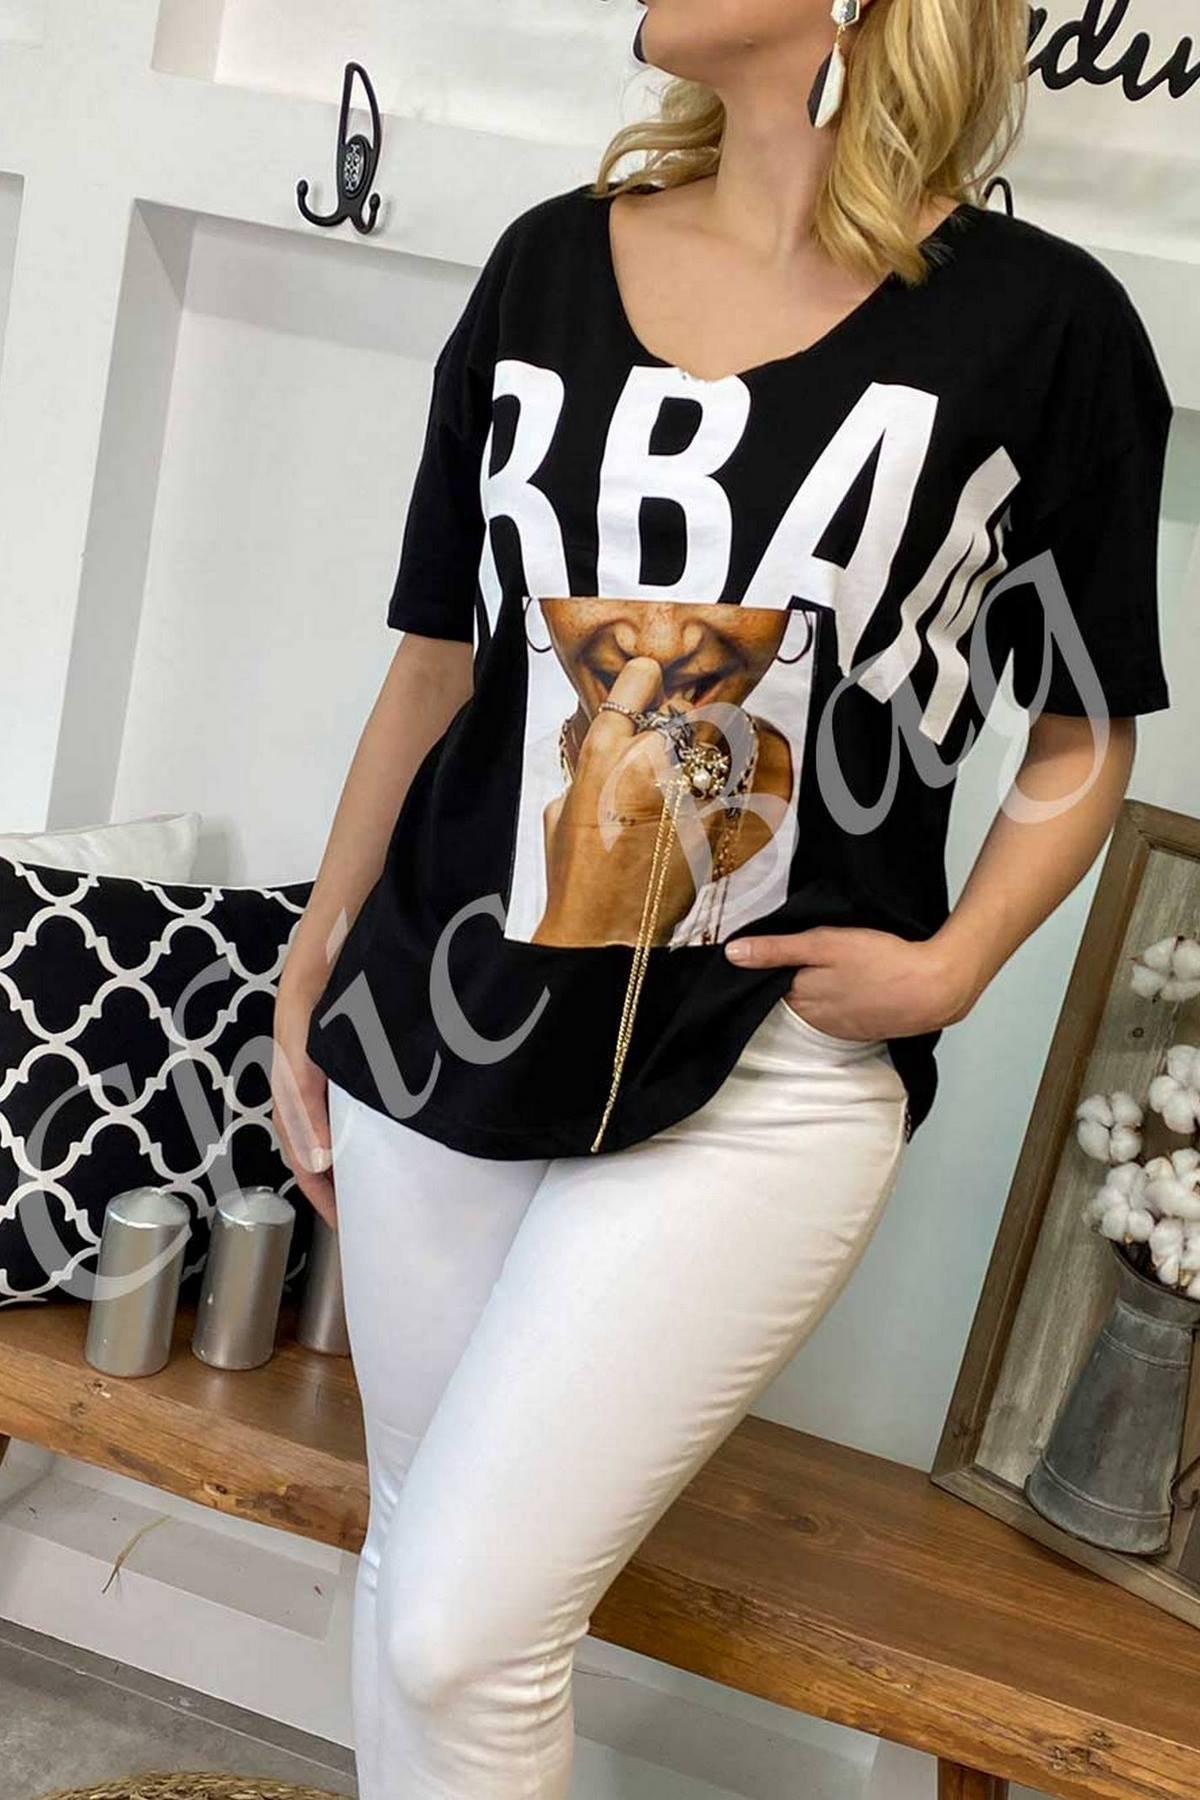 https://resim.chicbag.com.tr/p000889/shy/urban-baski-resimli-t-shirt-crp-01e46e348f0b.